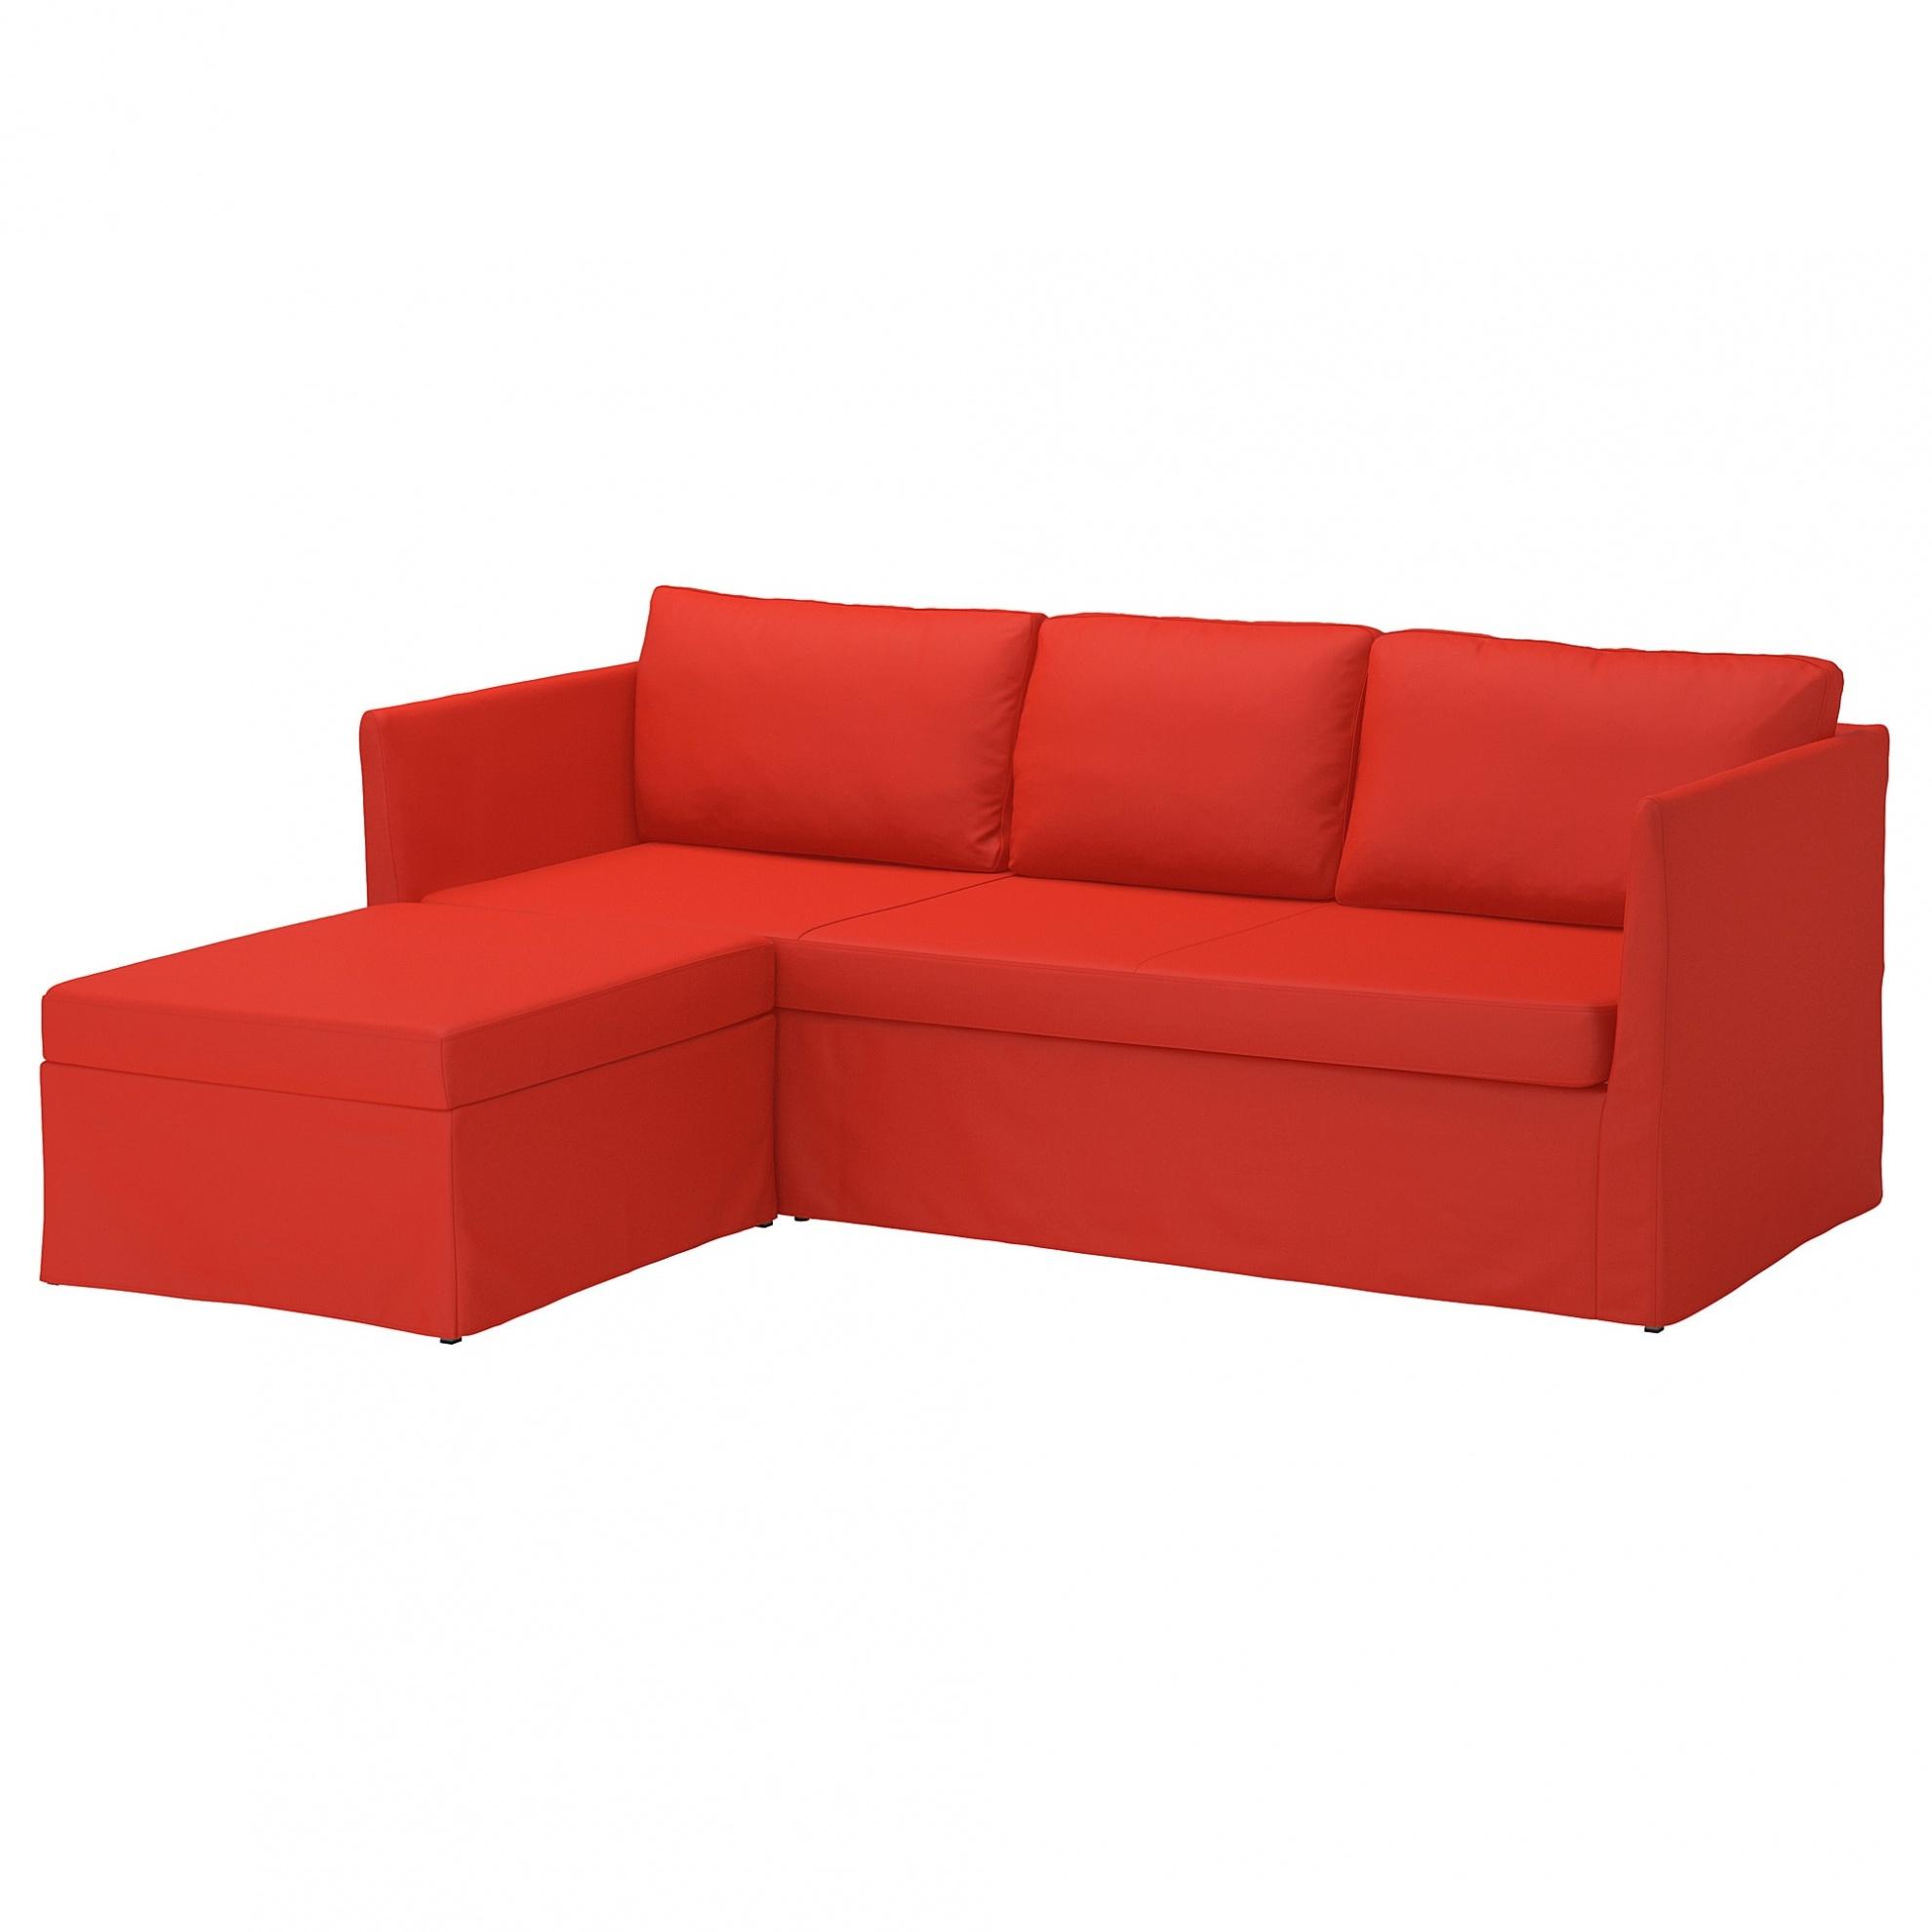 Ikea Canapé Convertible Angle Nouveau Image Maha S Canapé Tissu 3 Places Home Mahagranda